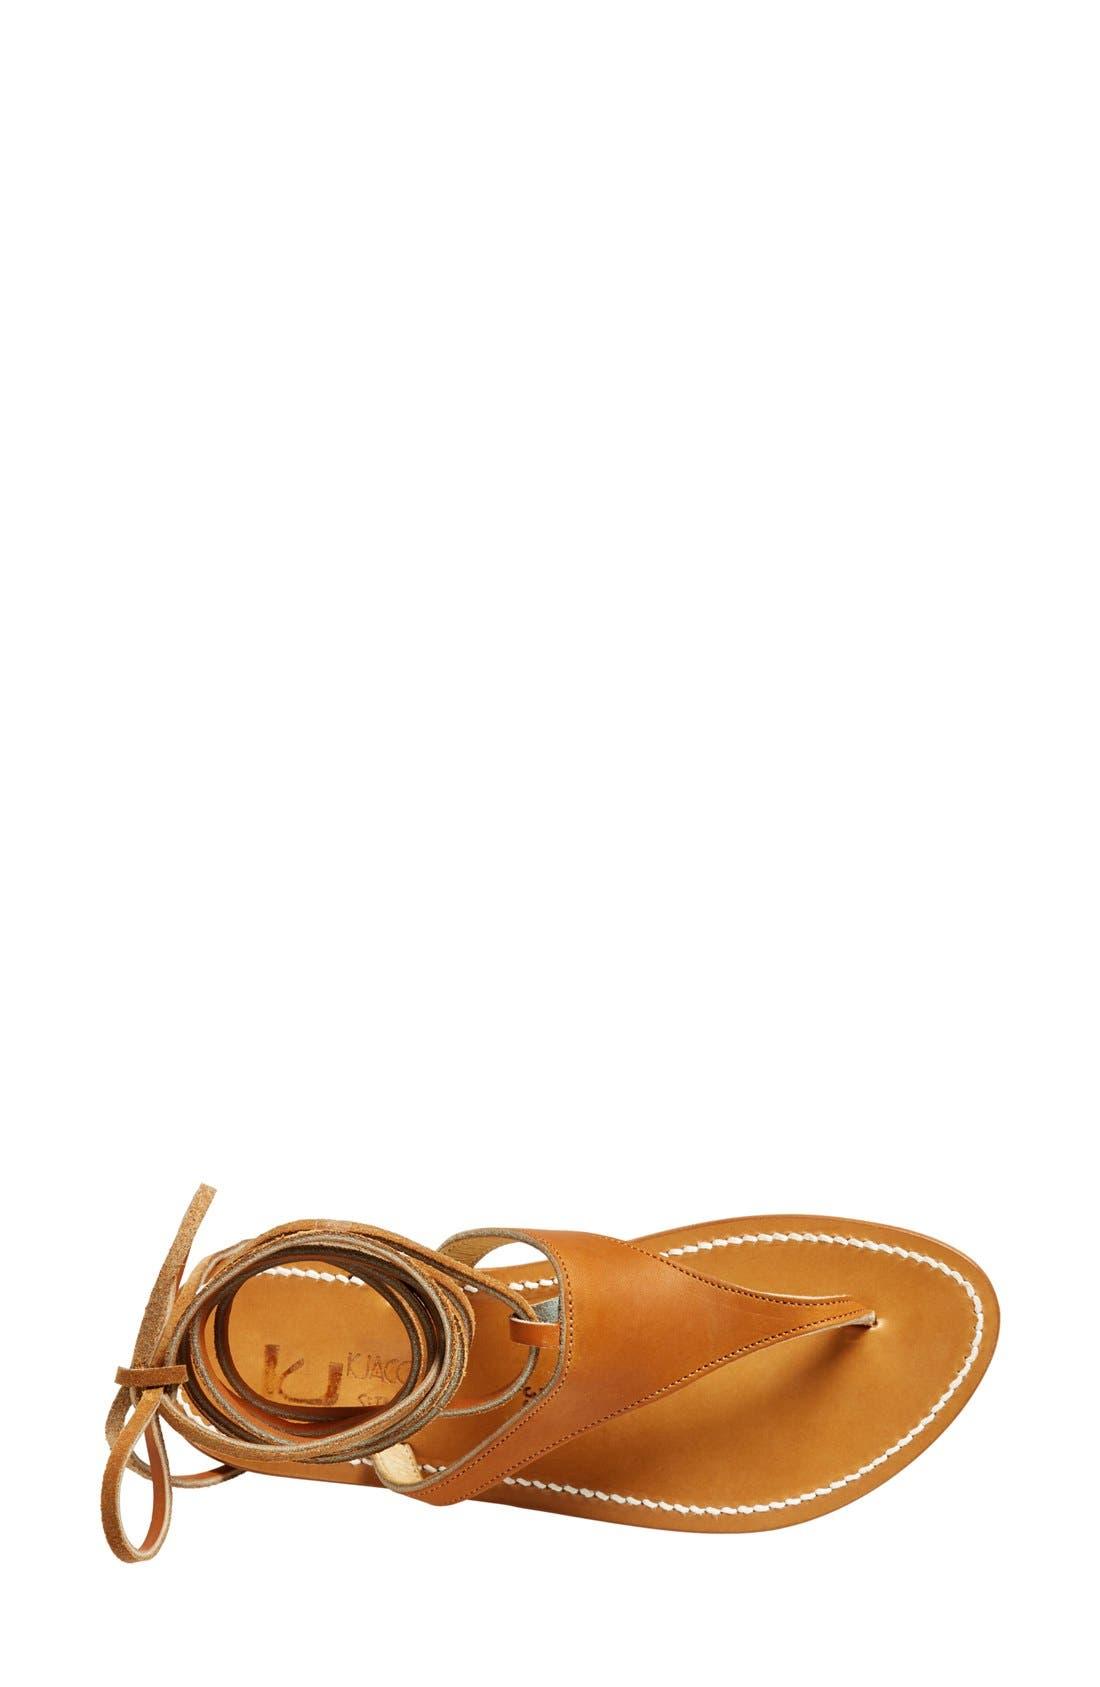 Alternate Image 3  - K.Jacques St. Tropez Ankle Wrap Thong Sandal (Women)